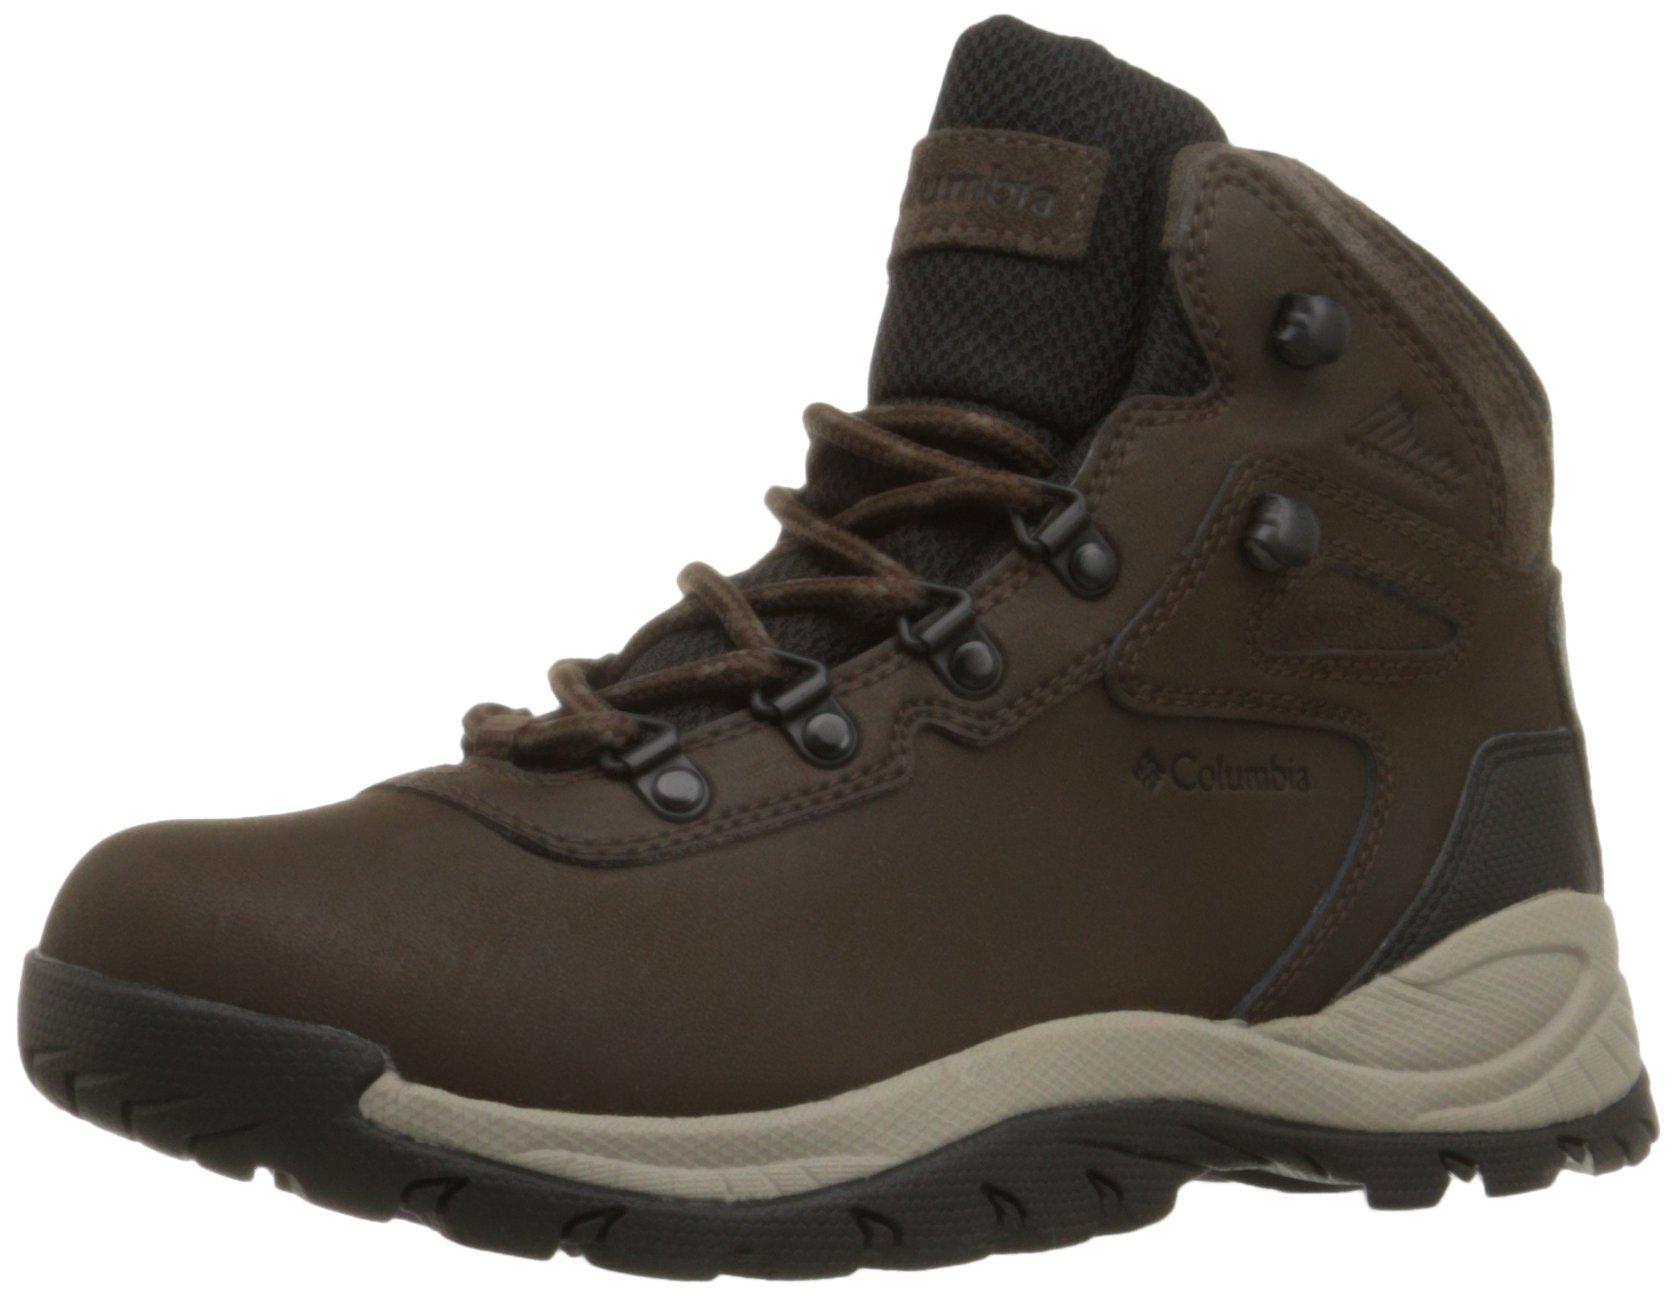 Columbia Women's Newton Ridge Plus Hiking Boot, Cordovan/Crown Jewel, 6 M US